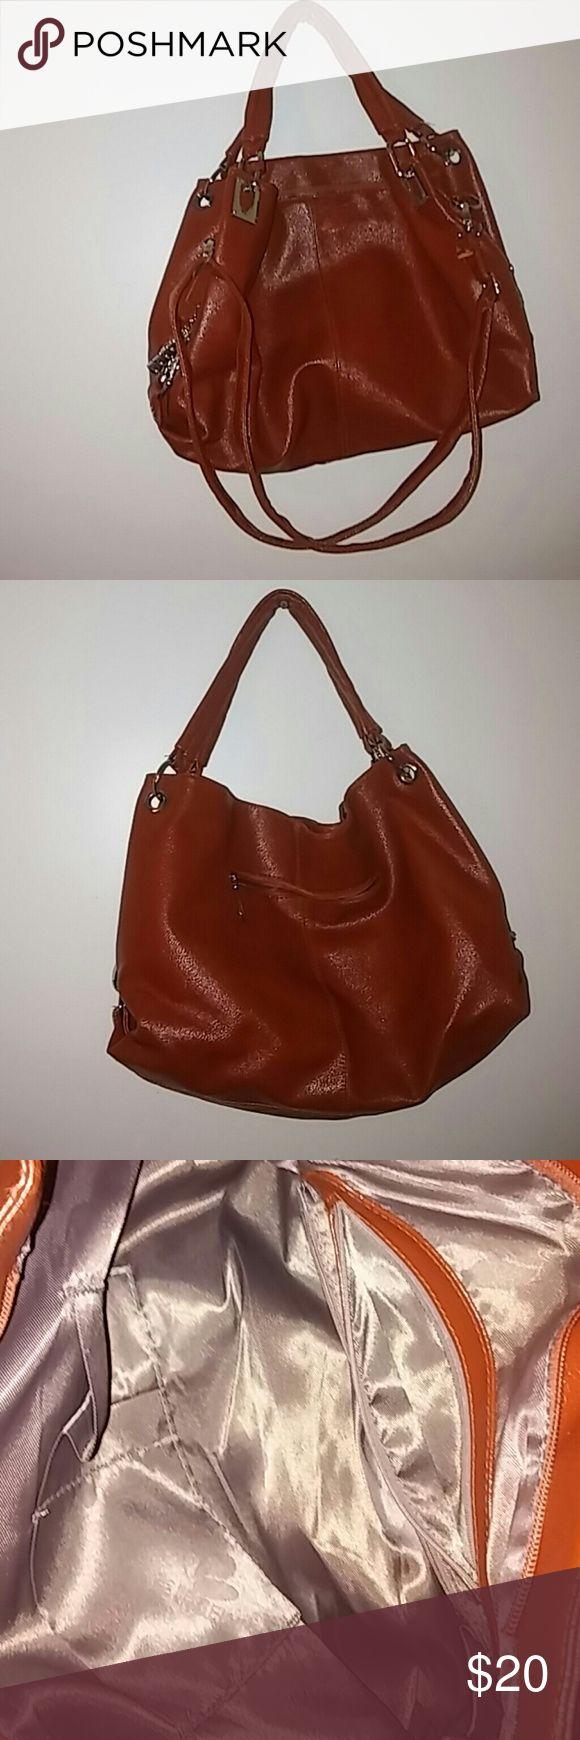 Beini purse Like new, medium sized bag, silver hardwear Bags Shoulder Bags